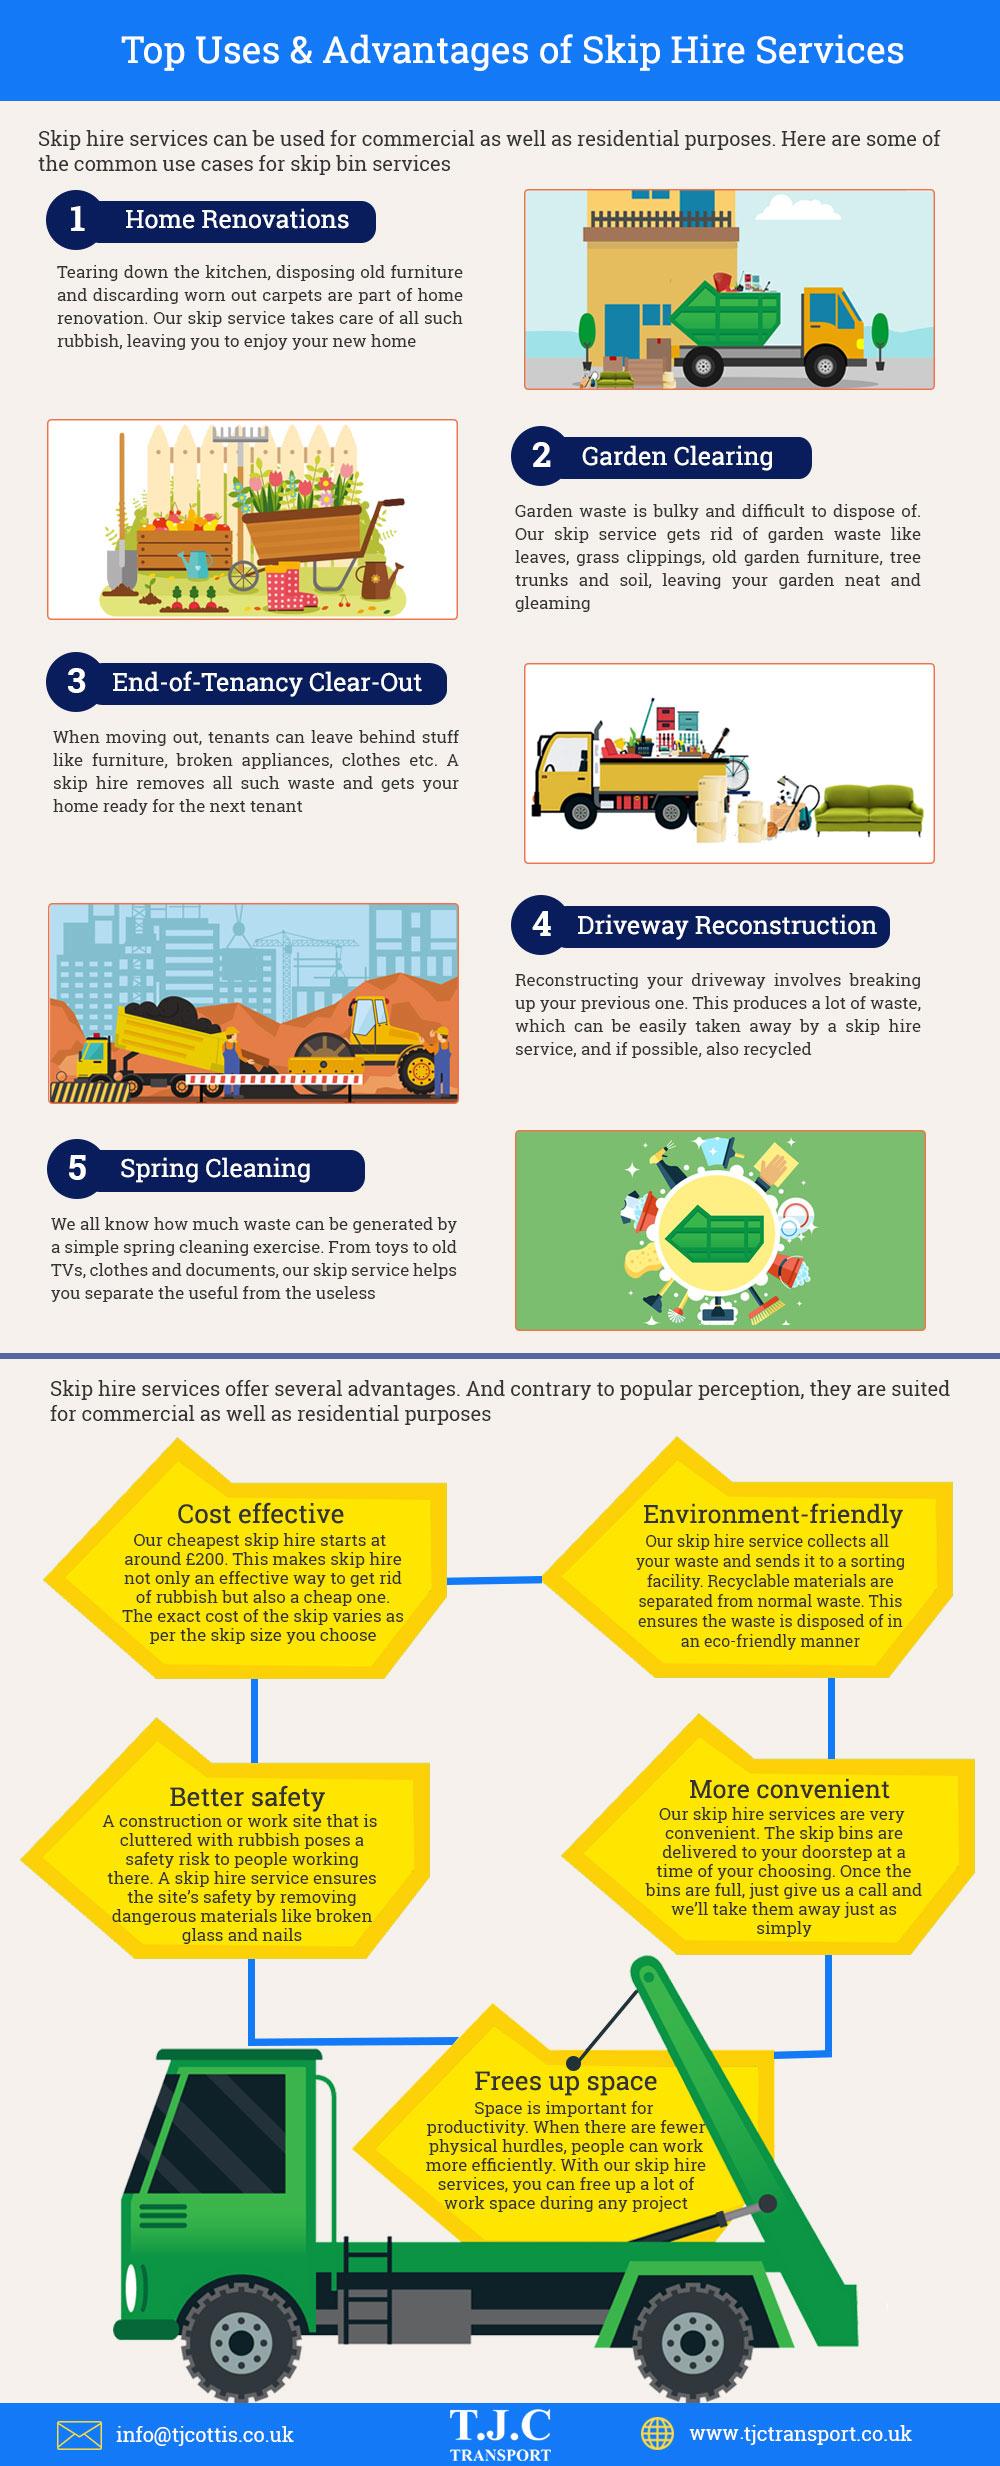 Advantages of Skip Hire Services